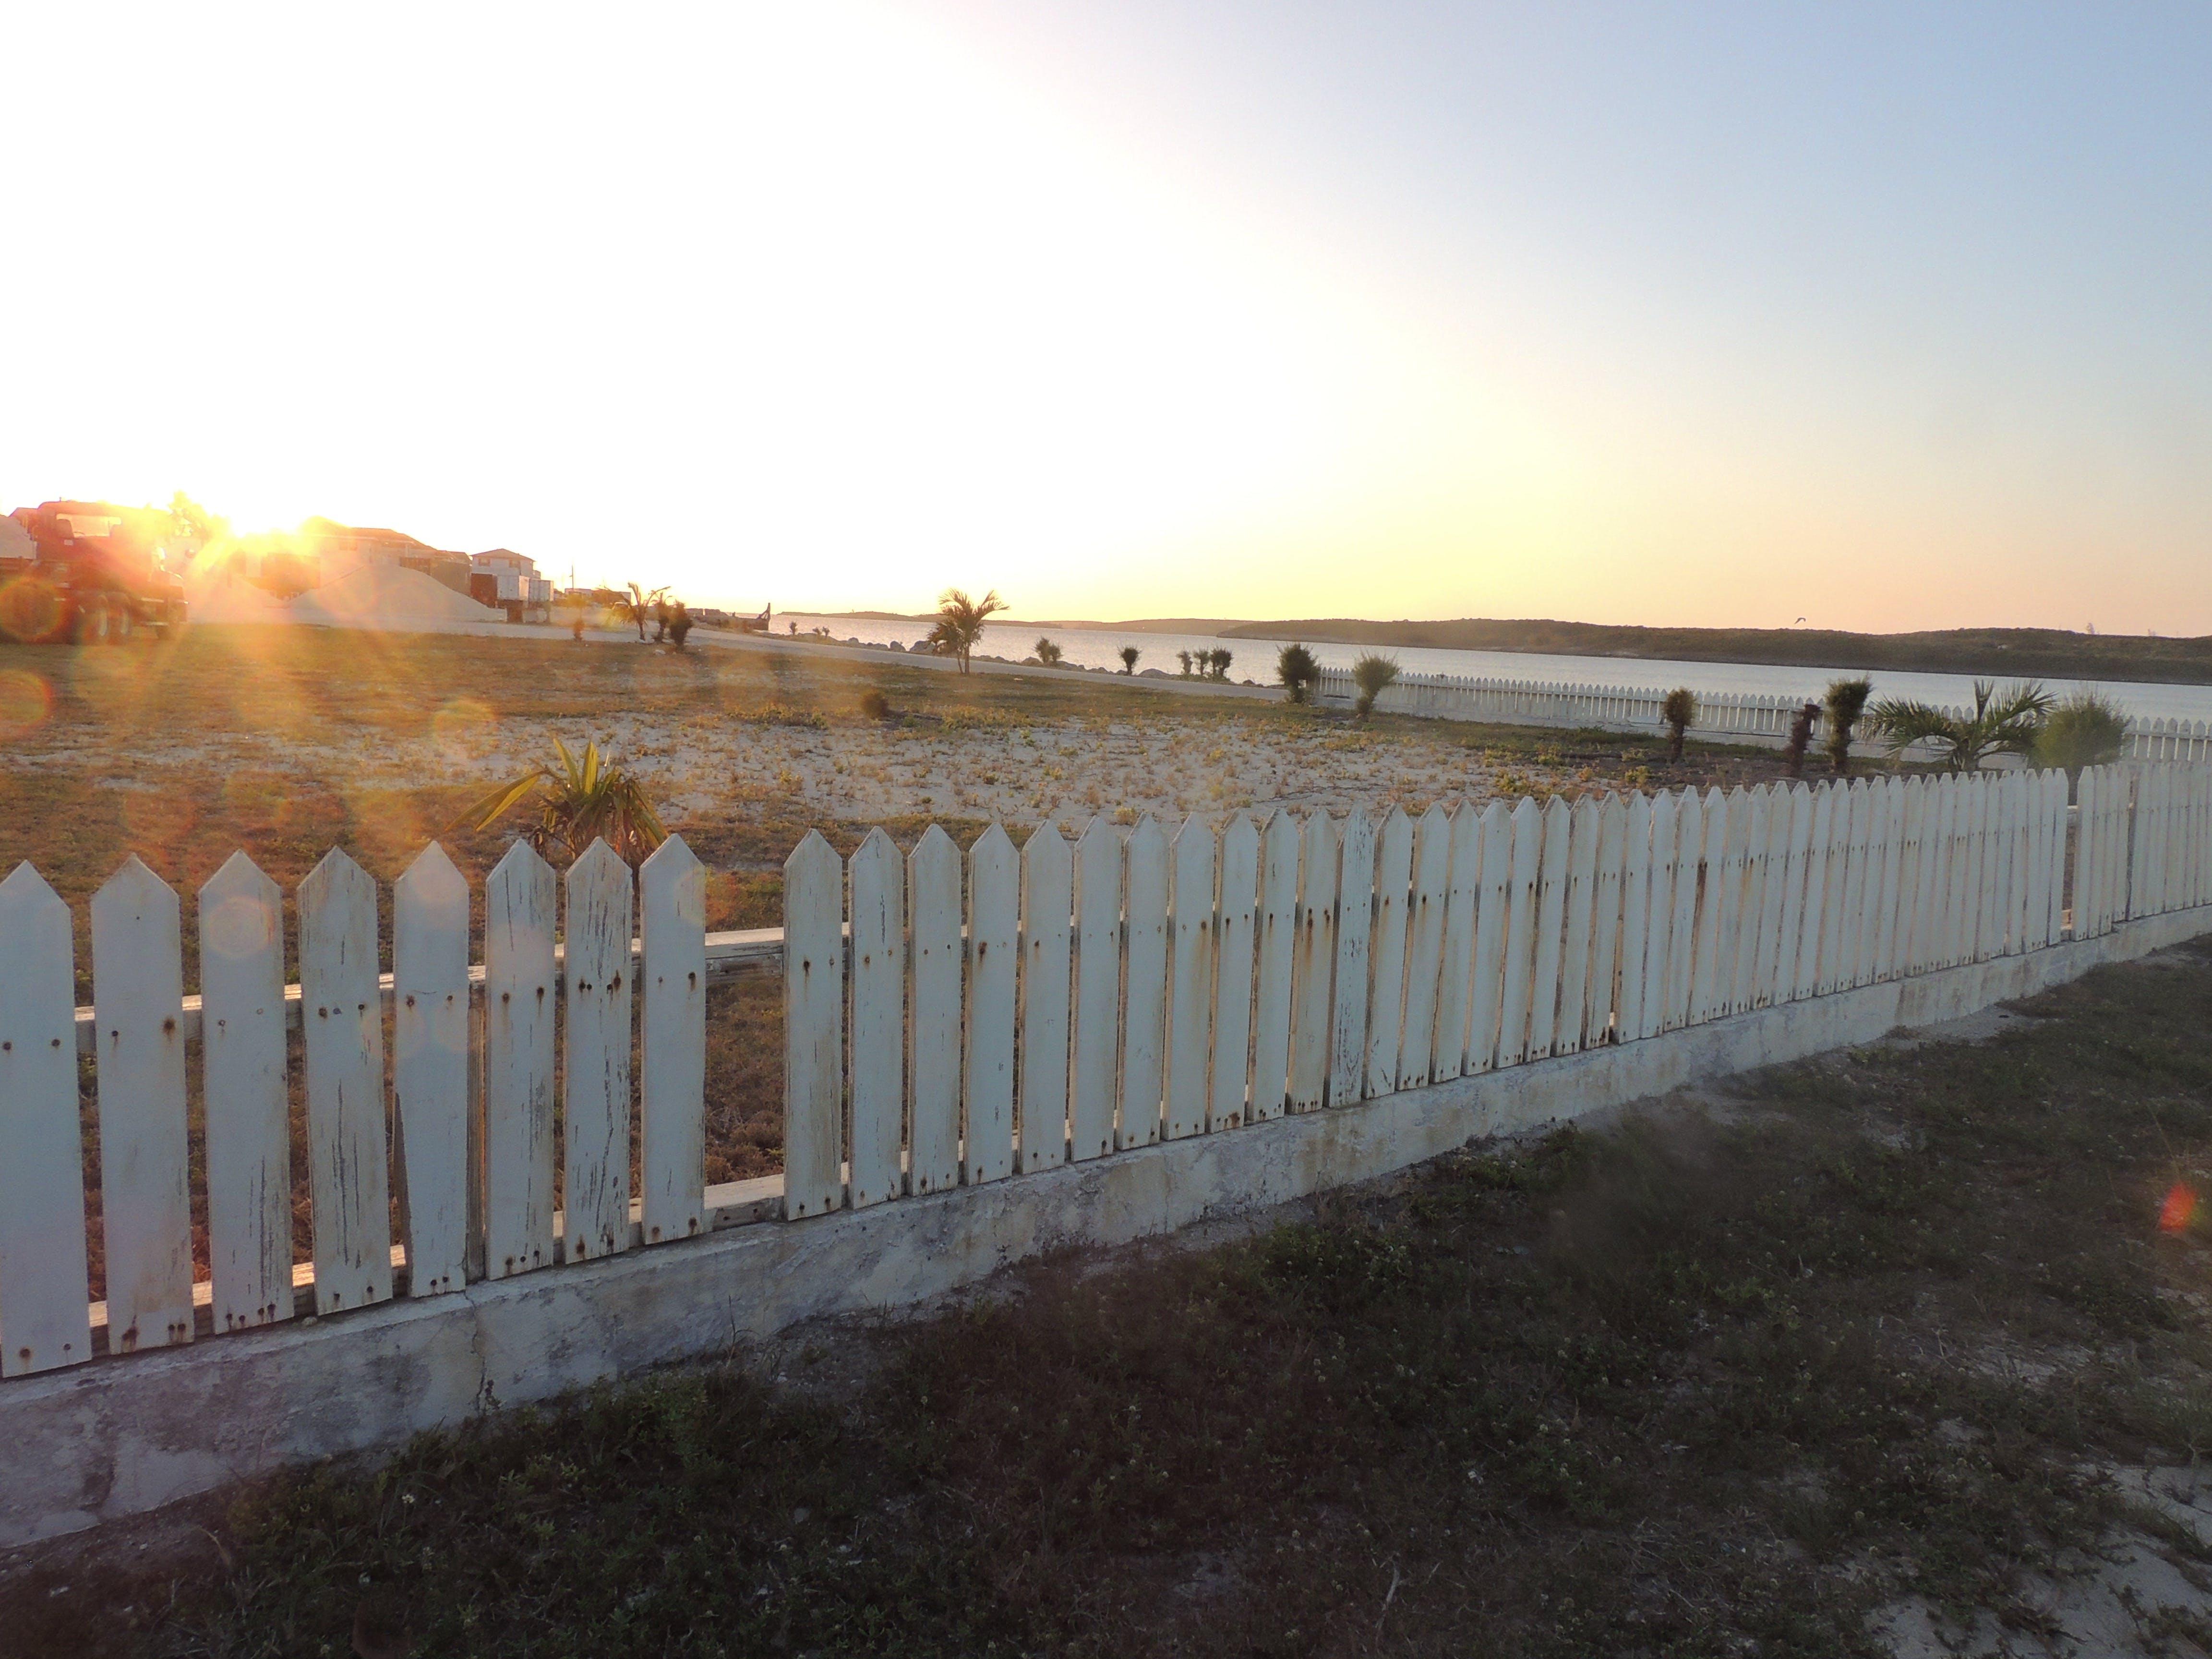 Free stock photo of evening sun, fence, fences, golden sun